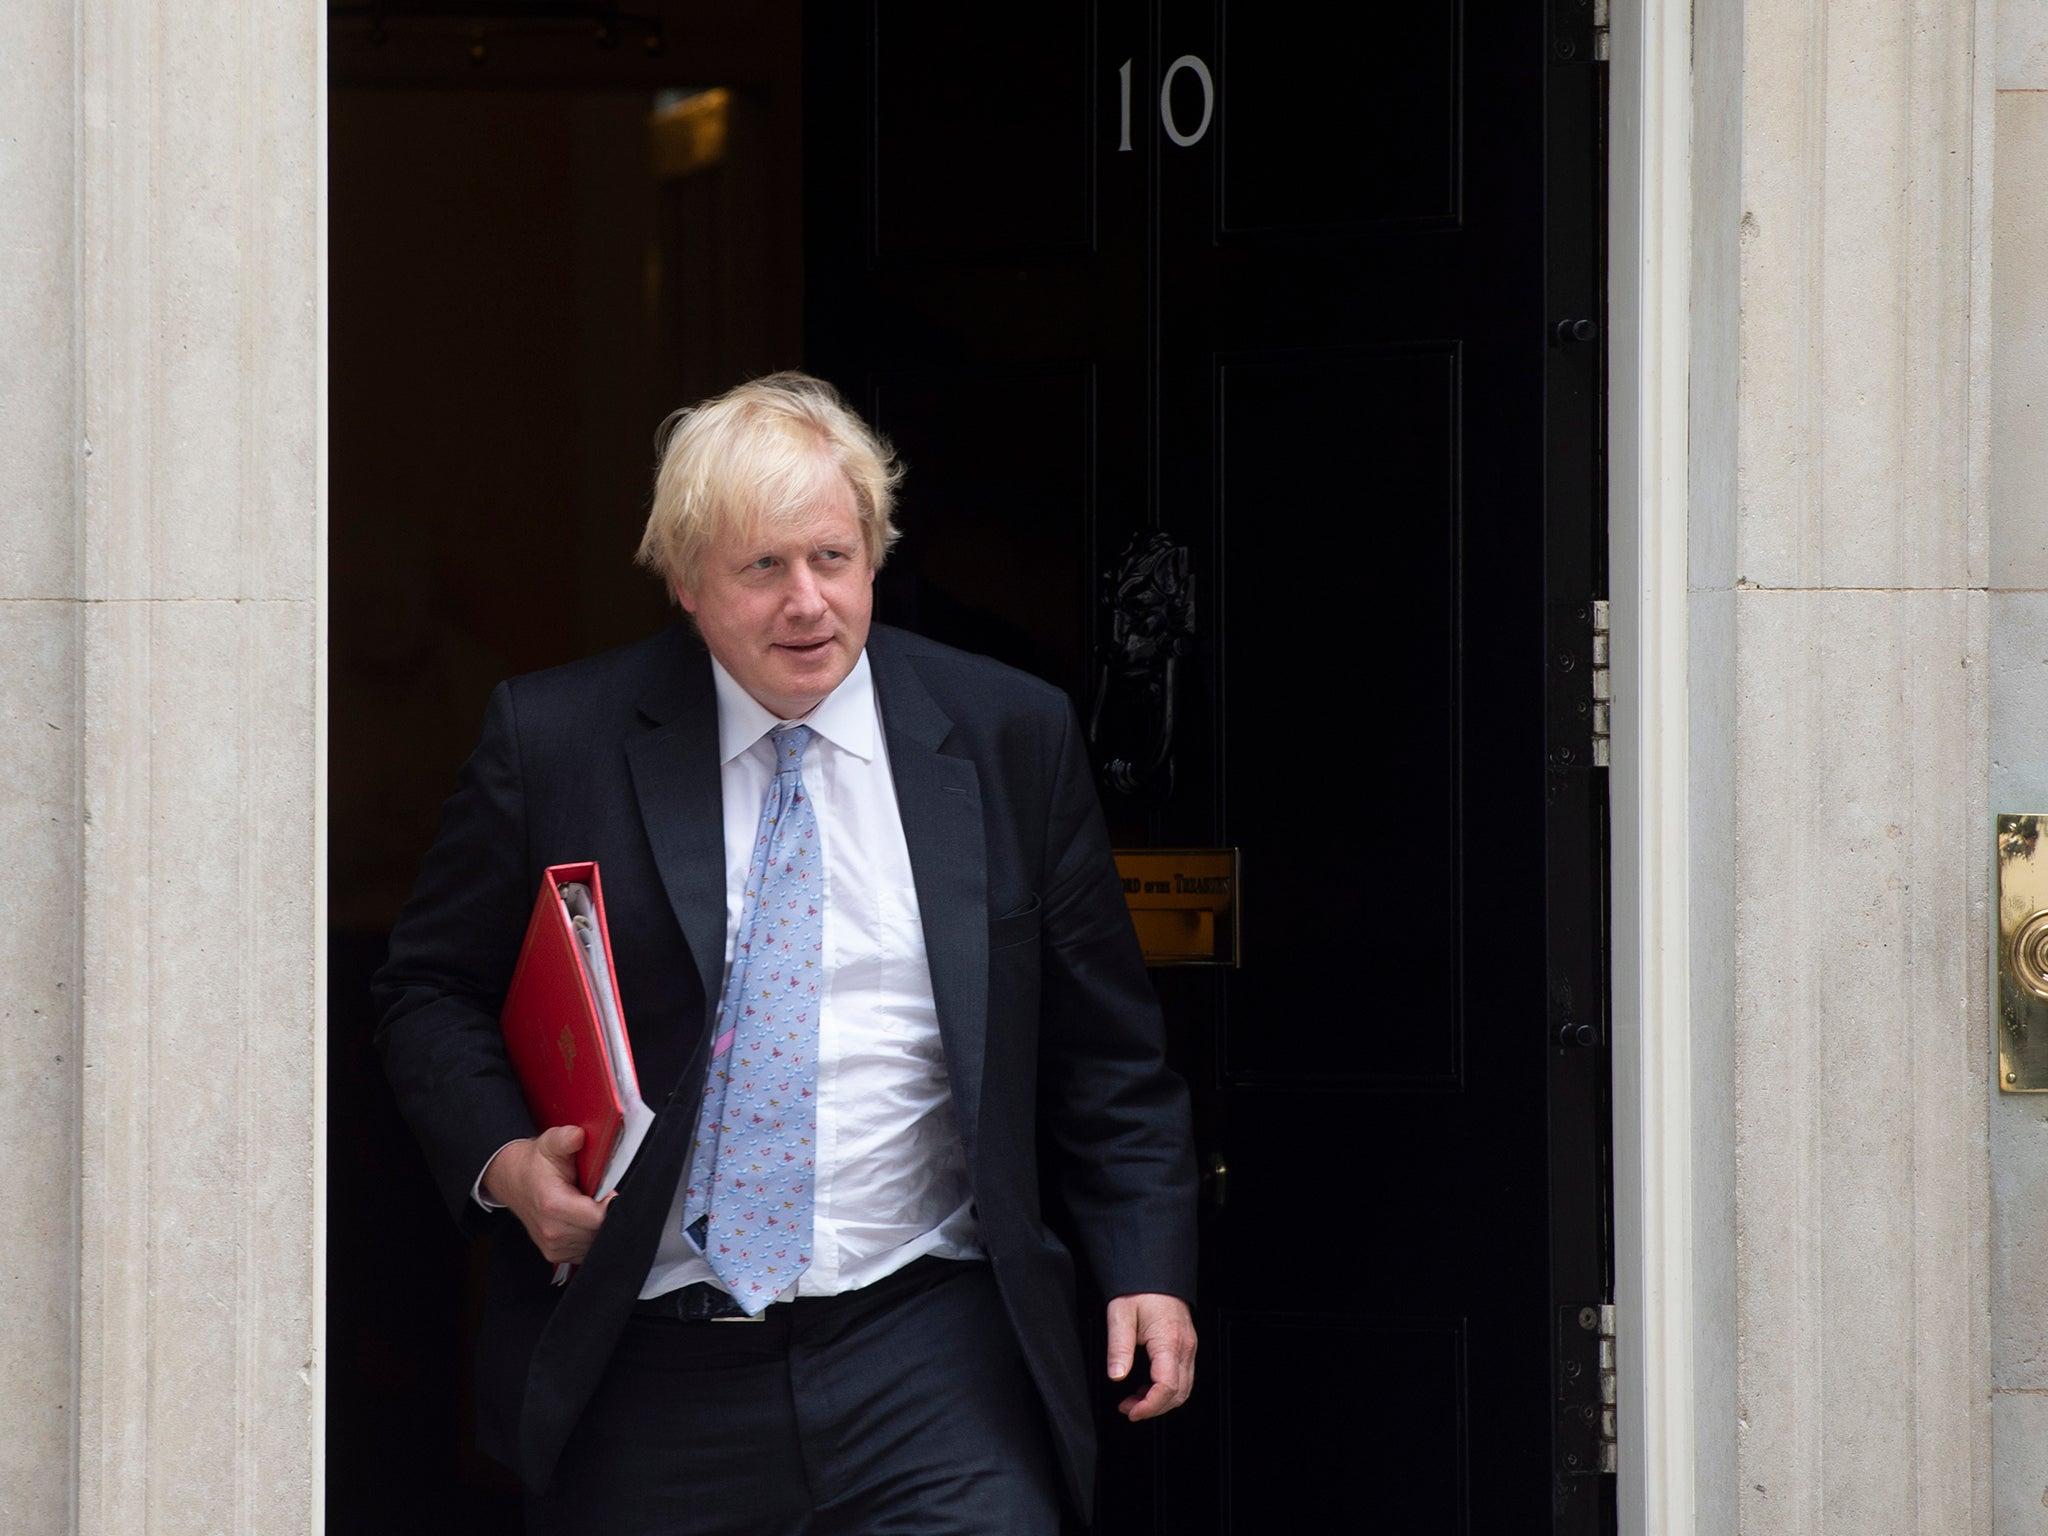 Read more Boris Johnson resignation Theresa May